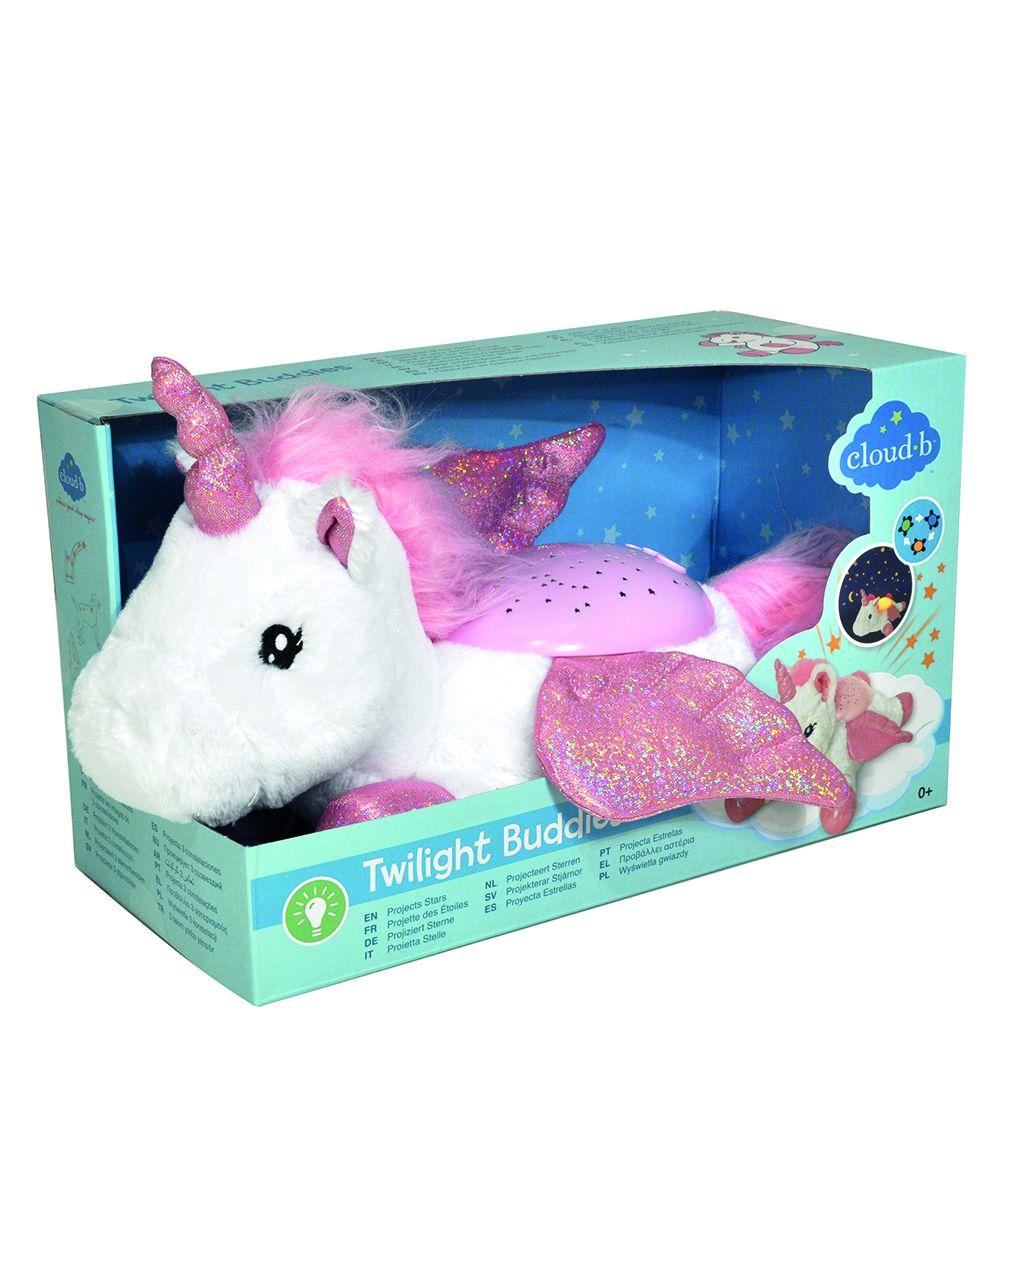 Cloud b - twilight buddies - winged unicorn - Cloud B